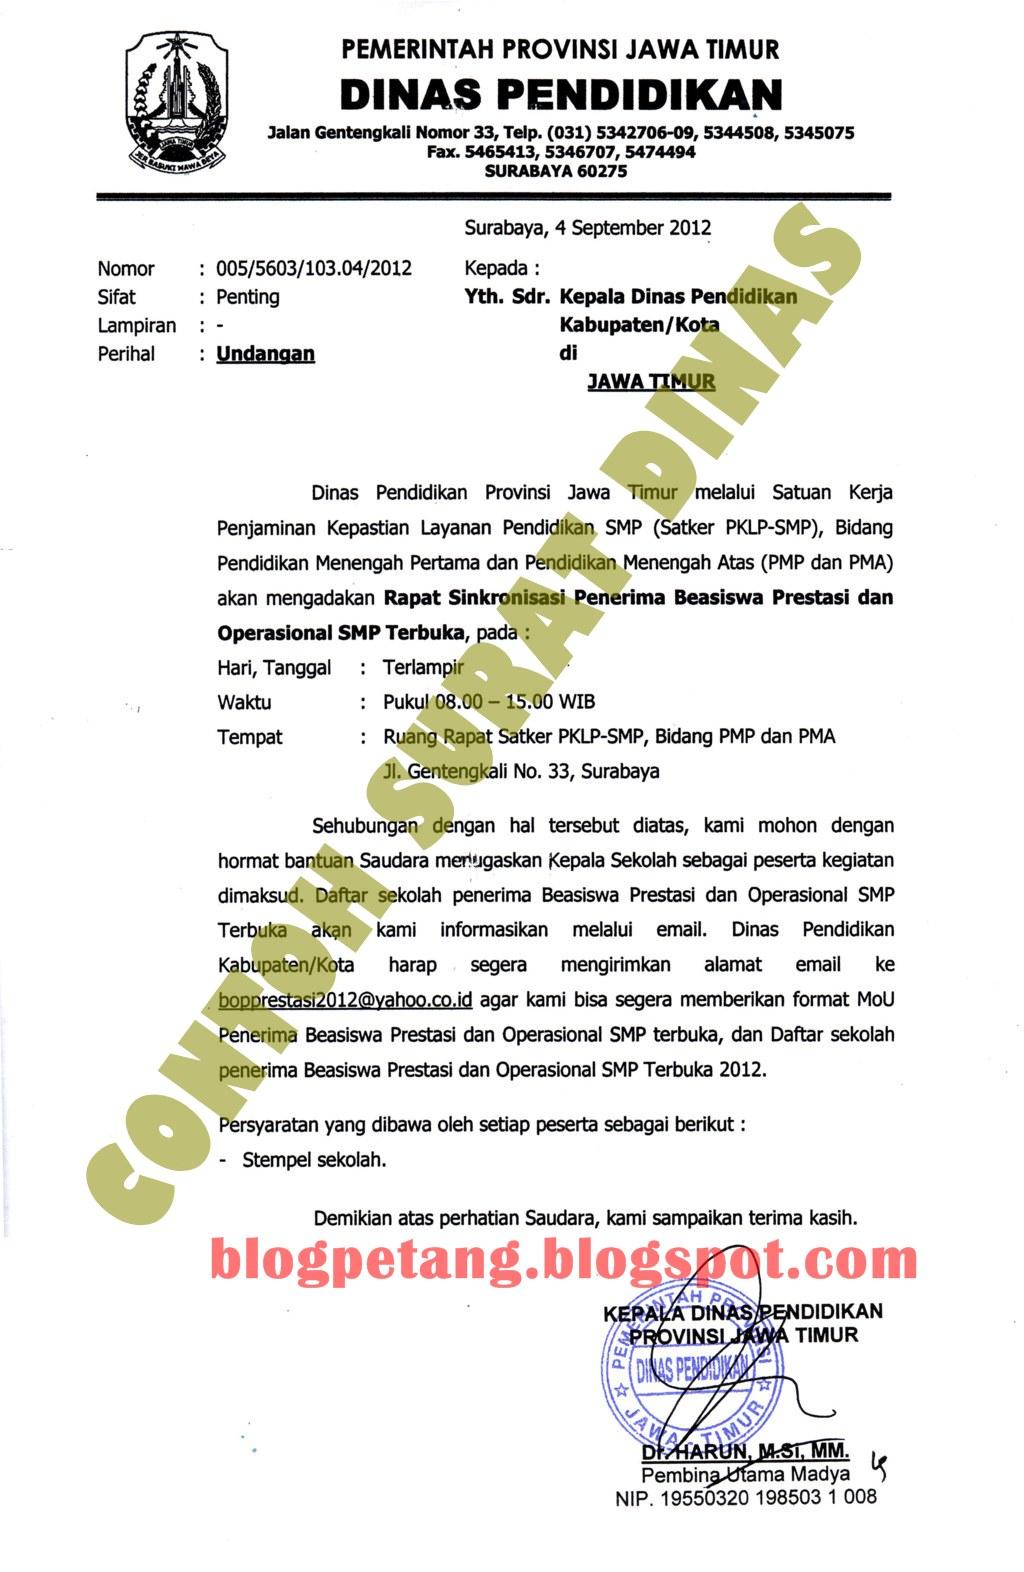 Contoh Surat Dinas Resmi Sekolah Terbaru 2013 | Info Internet